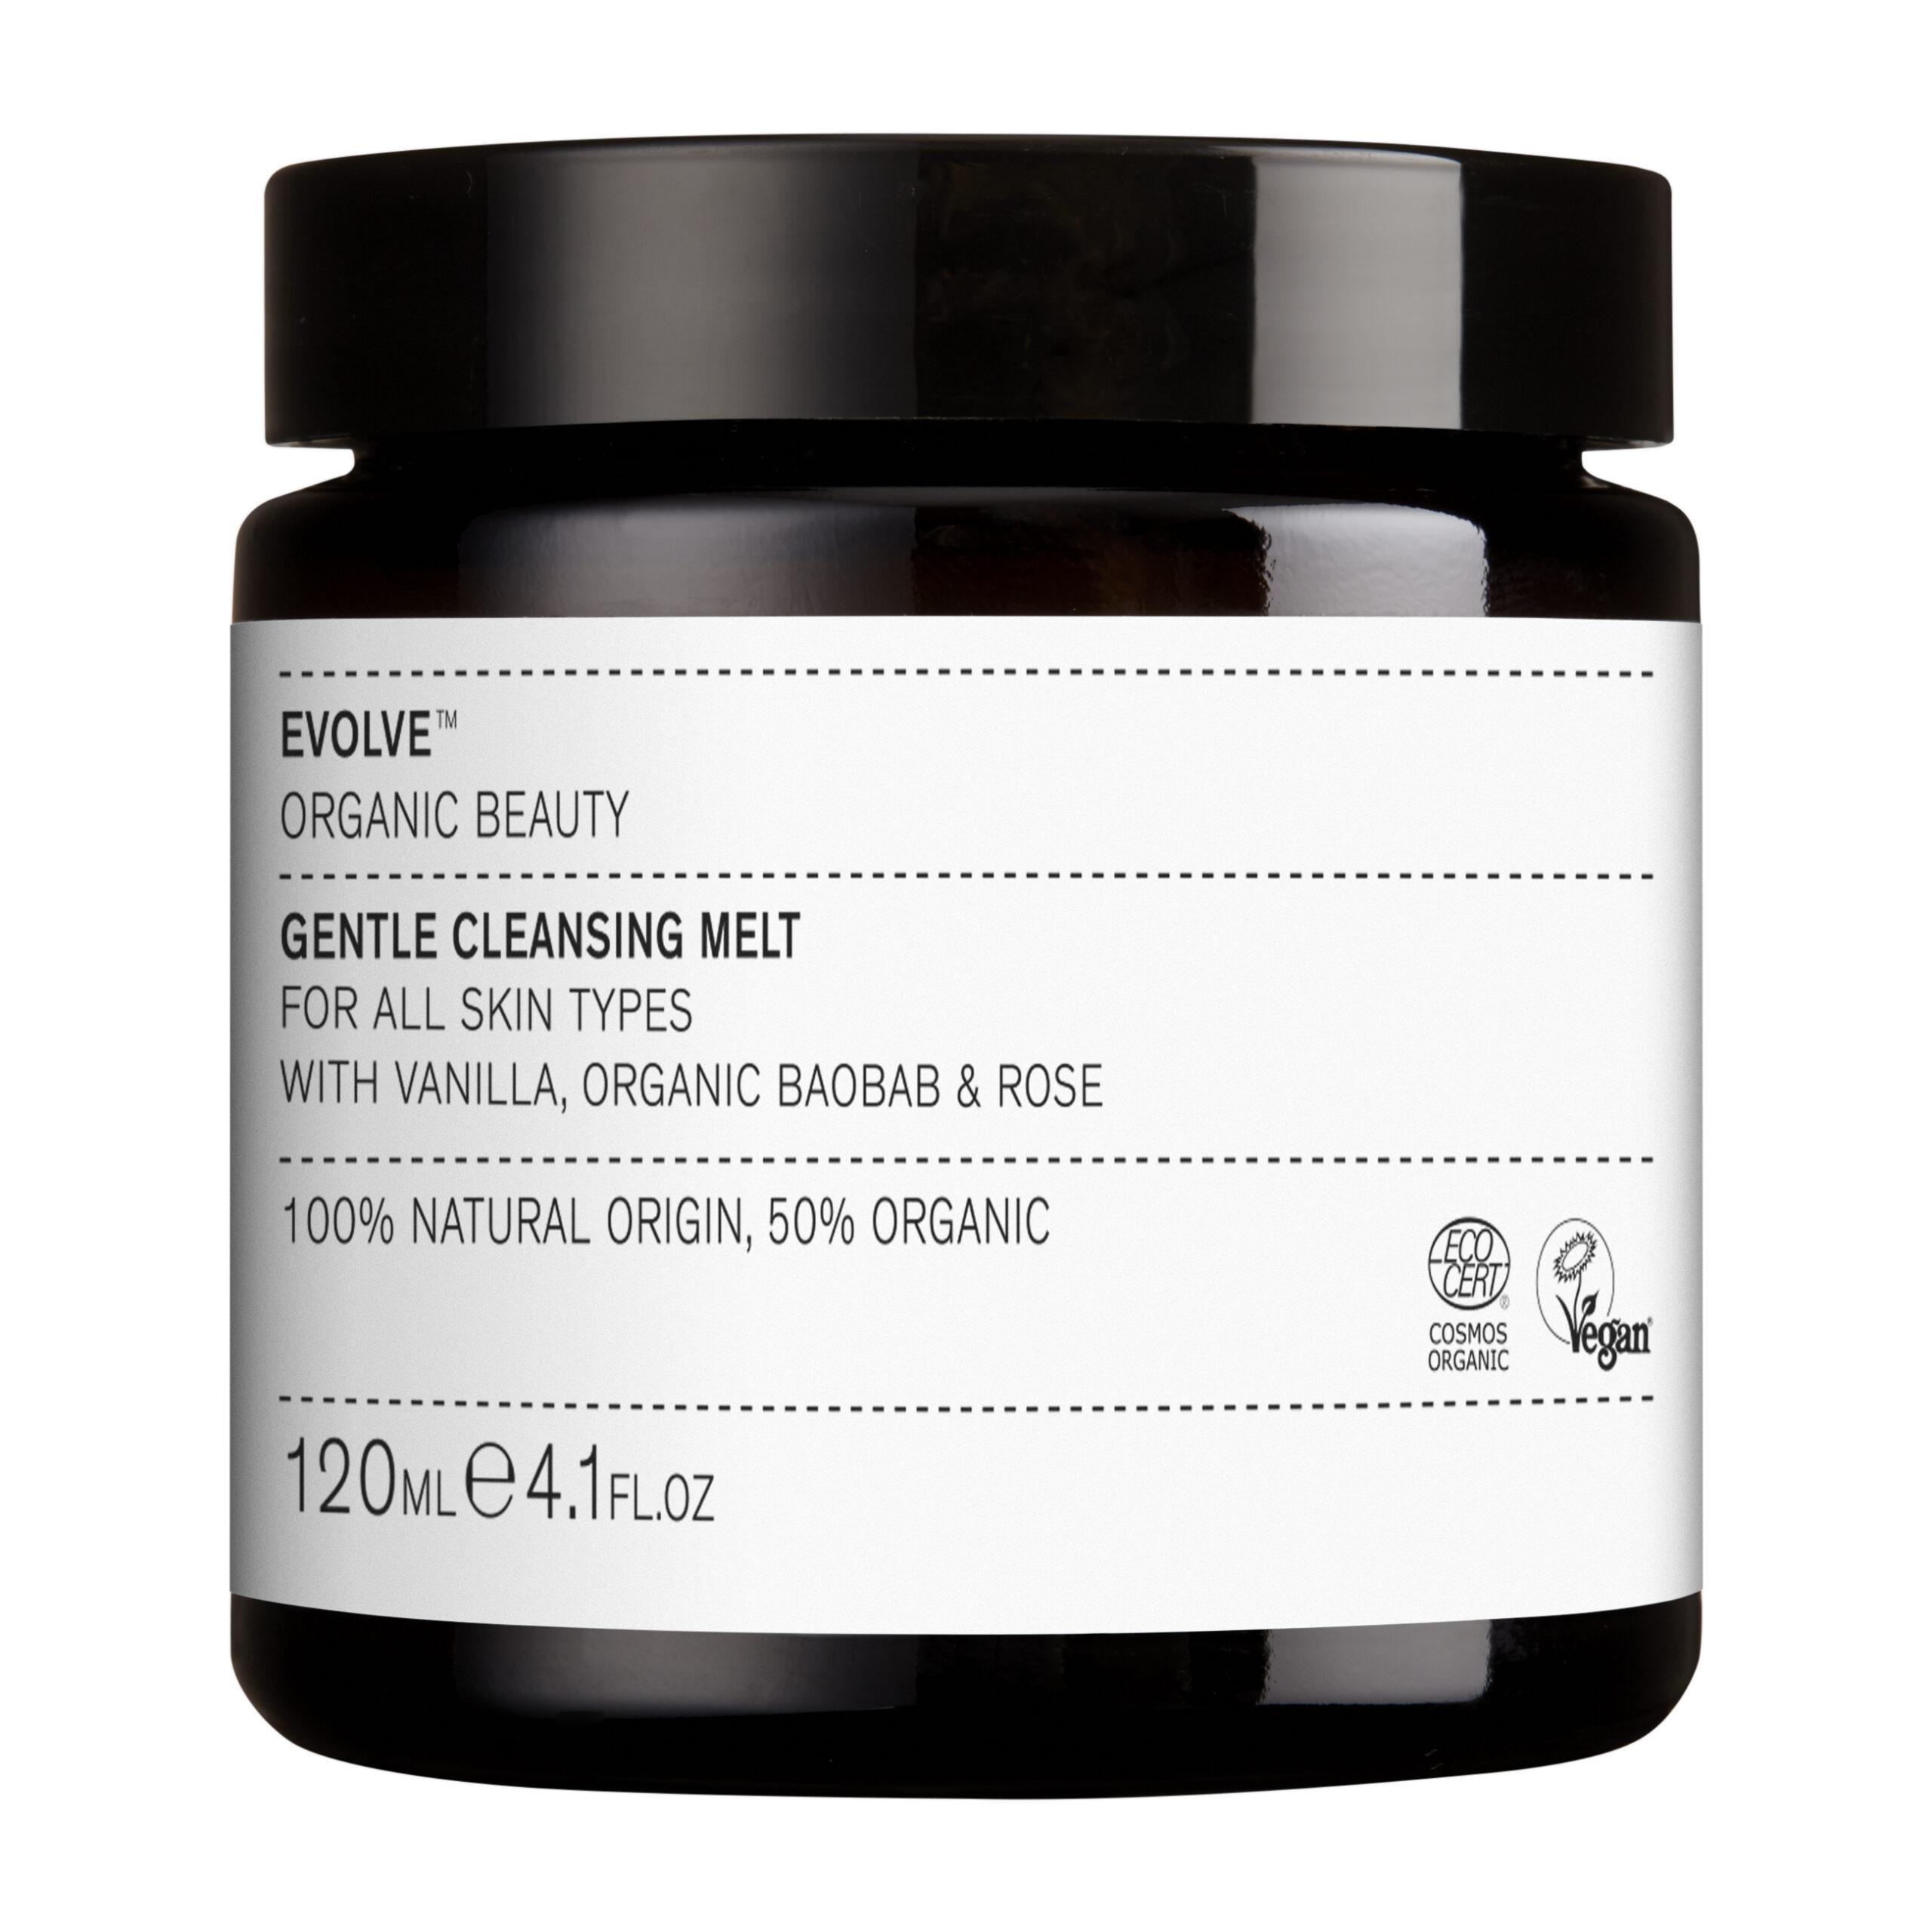 Gentle Cleansing Melt – Evolve Beauty